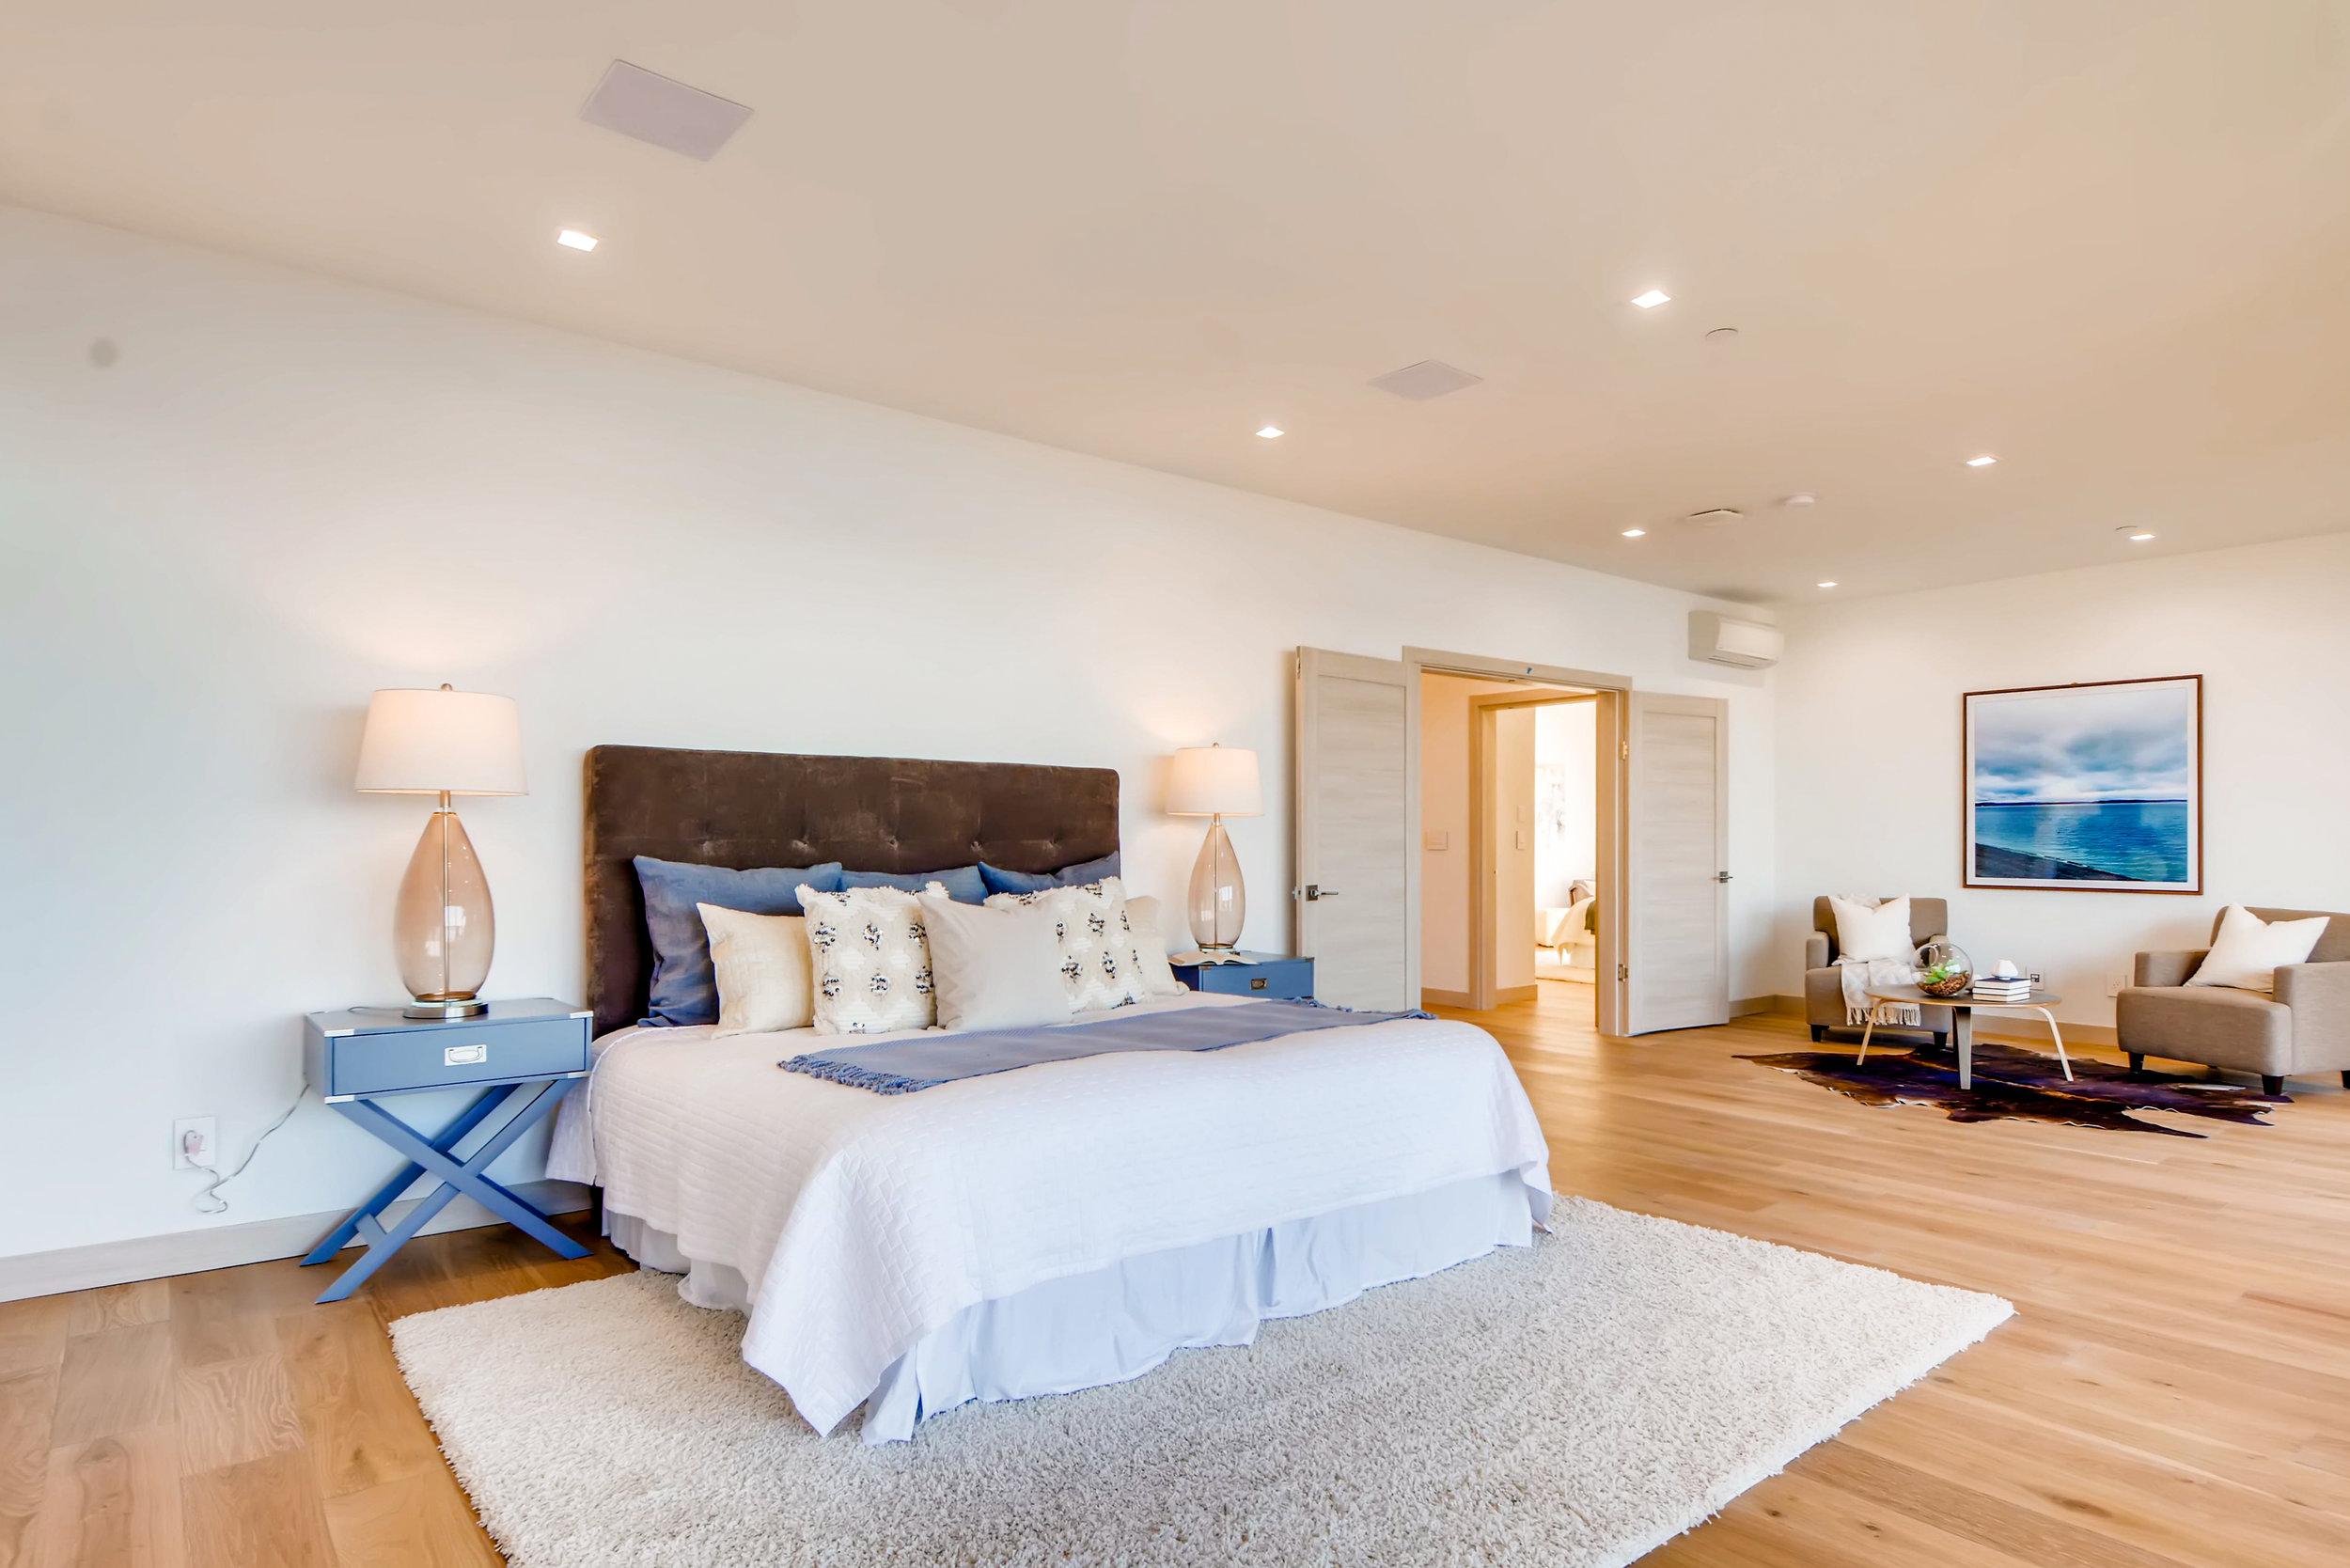 12410 Holmes Point Drive NE-print-018-36-2nd Floor Master Bedroom-4200x2803-300dpi.jpg